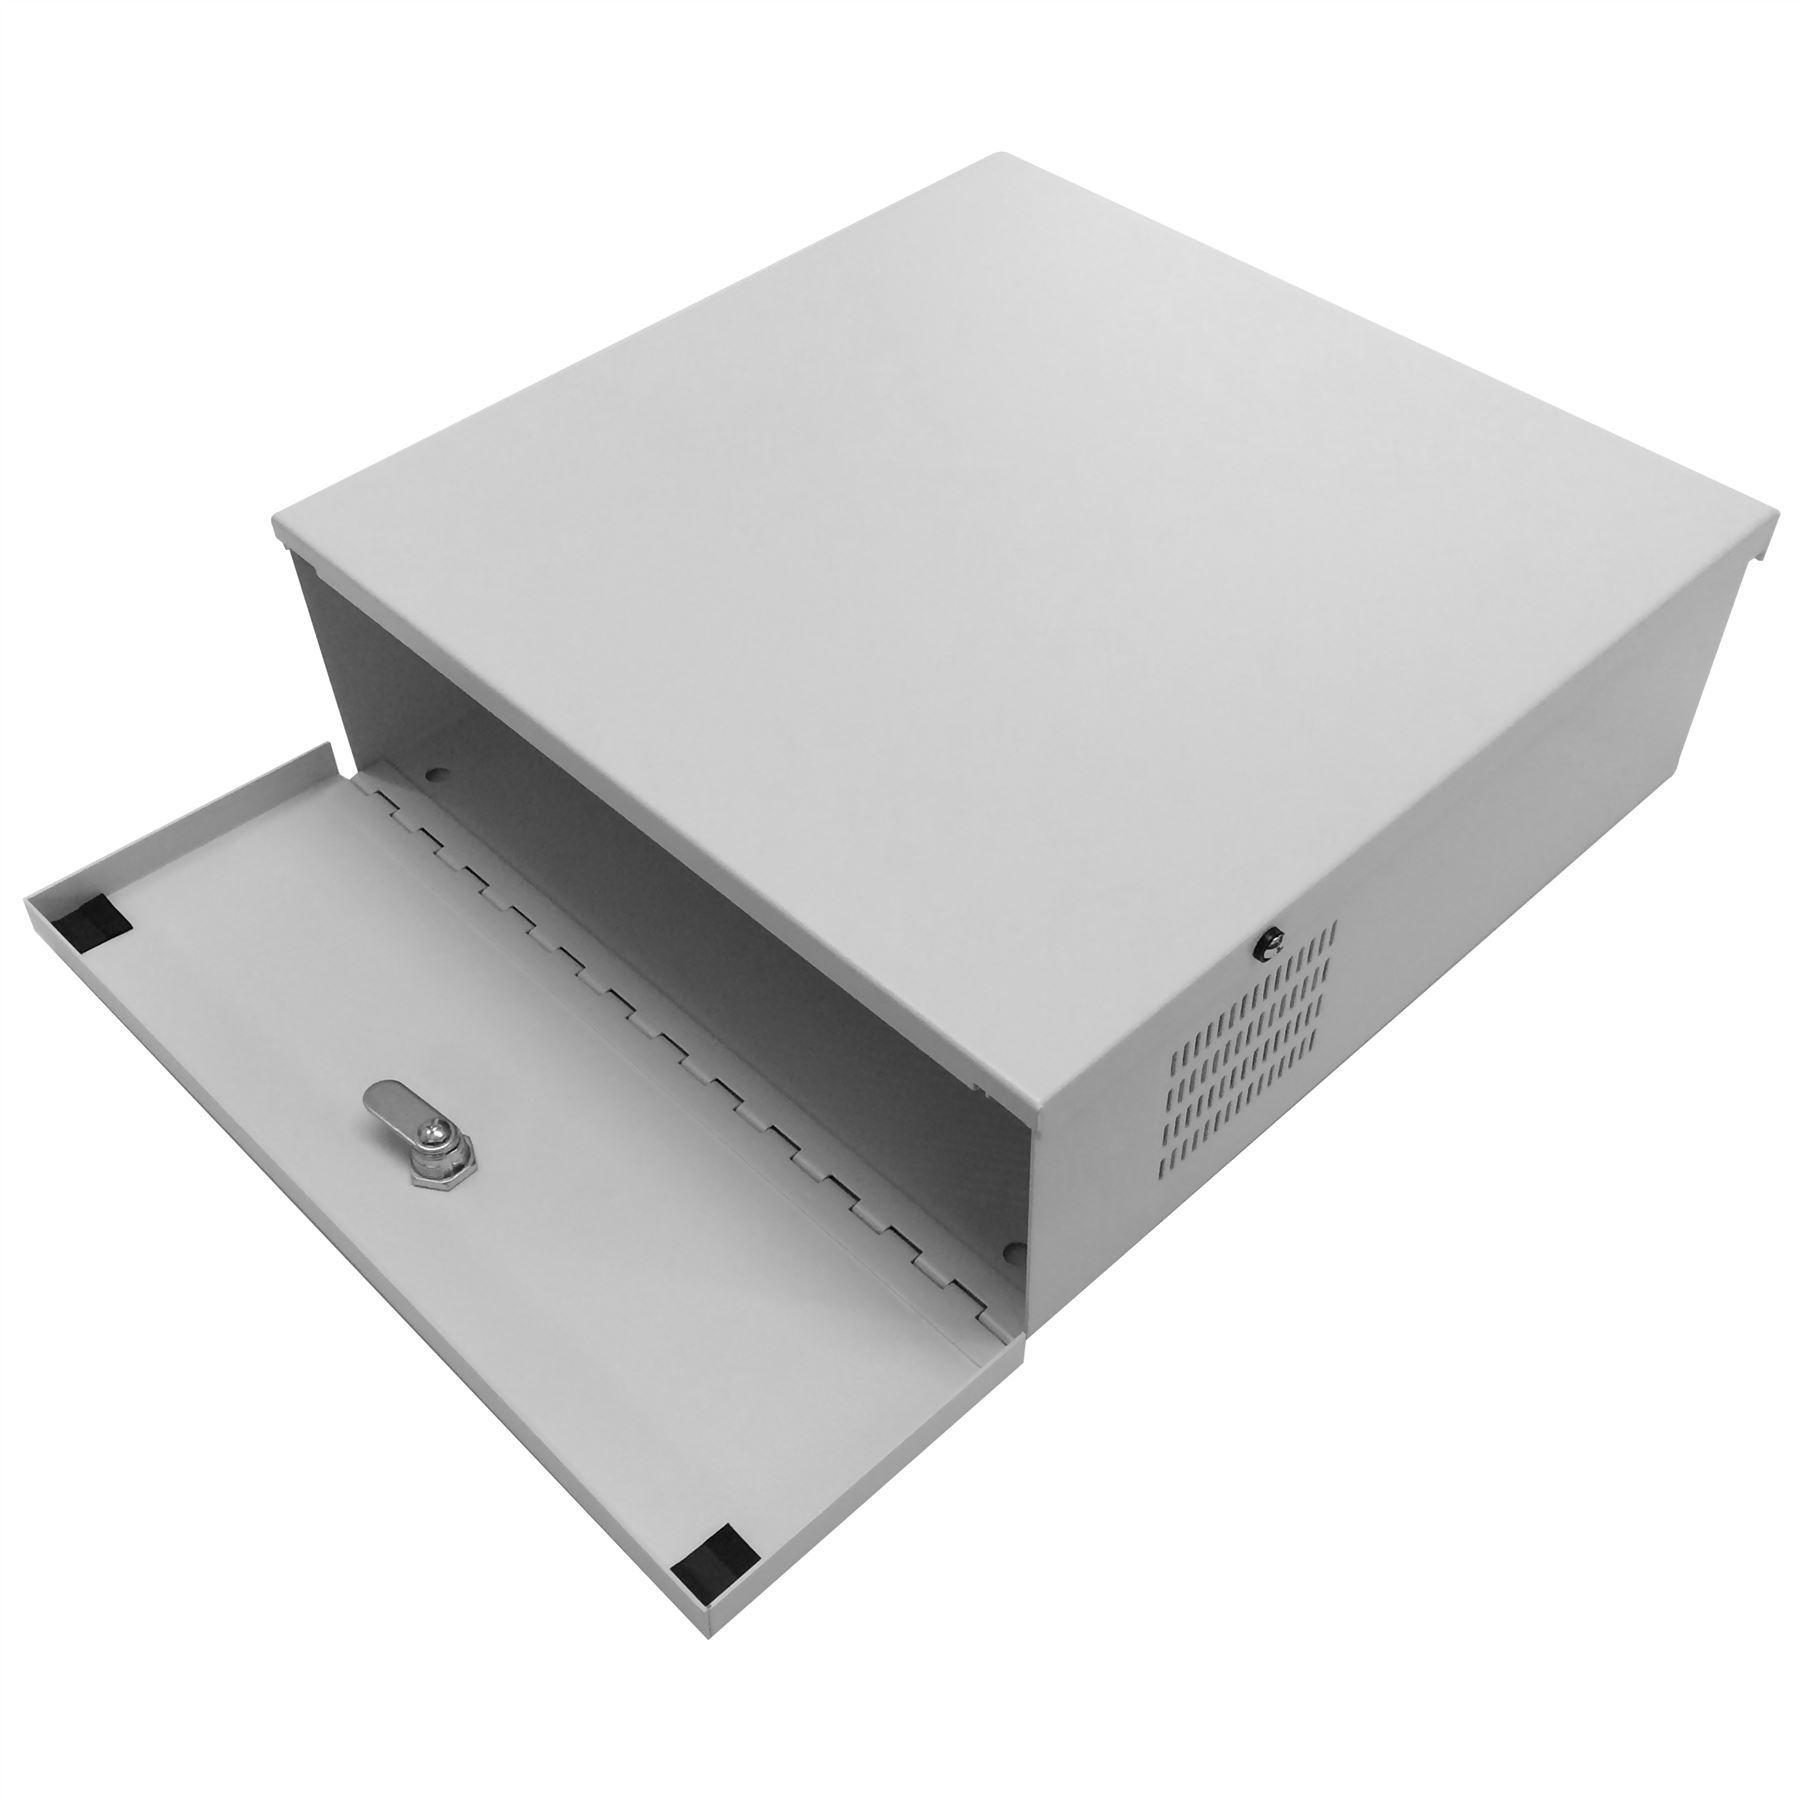 Maxx Digital Cctv Dvr Metal Safe Security Lock Box Small